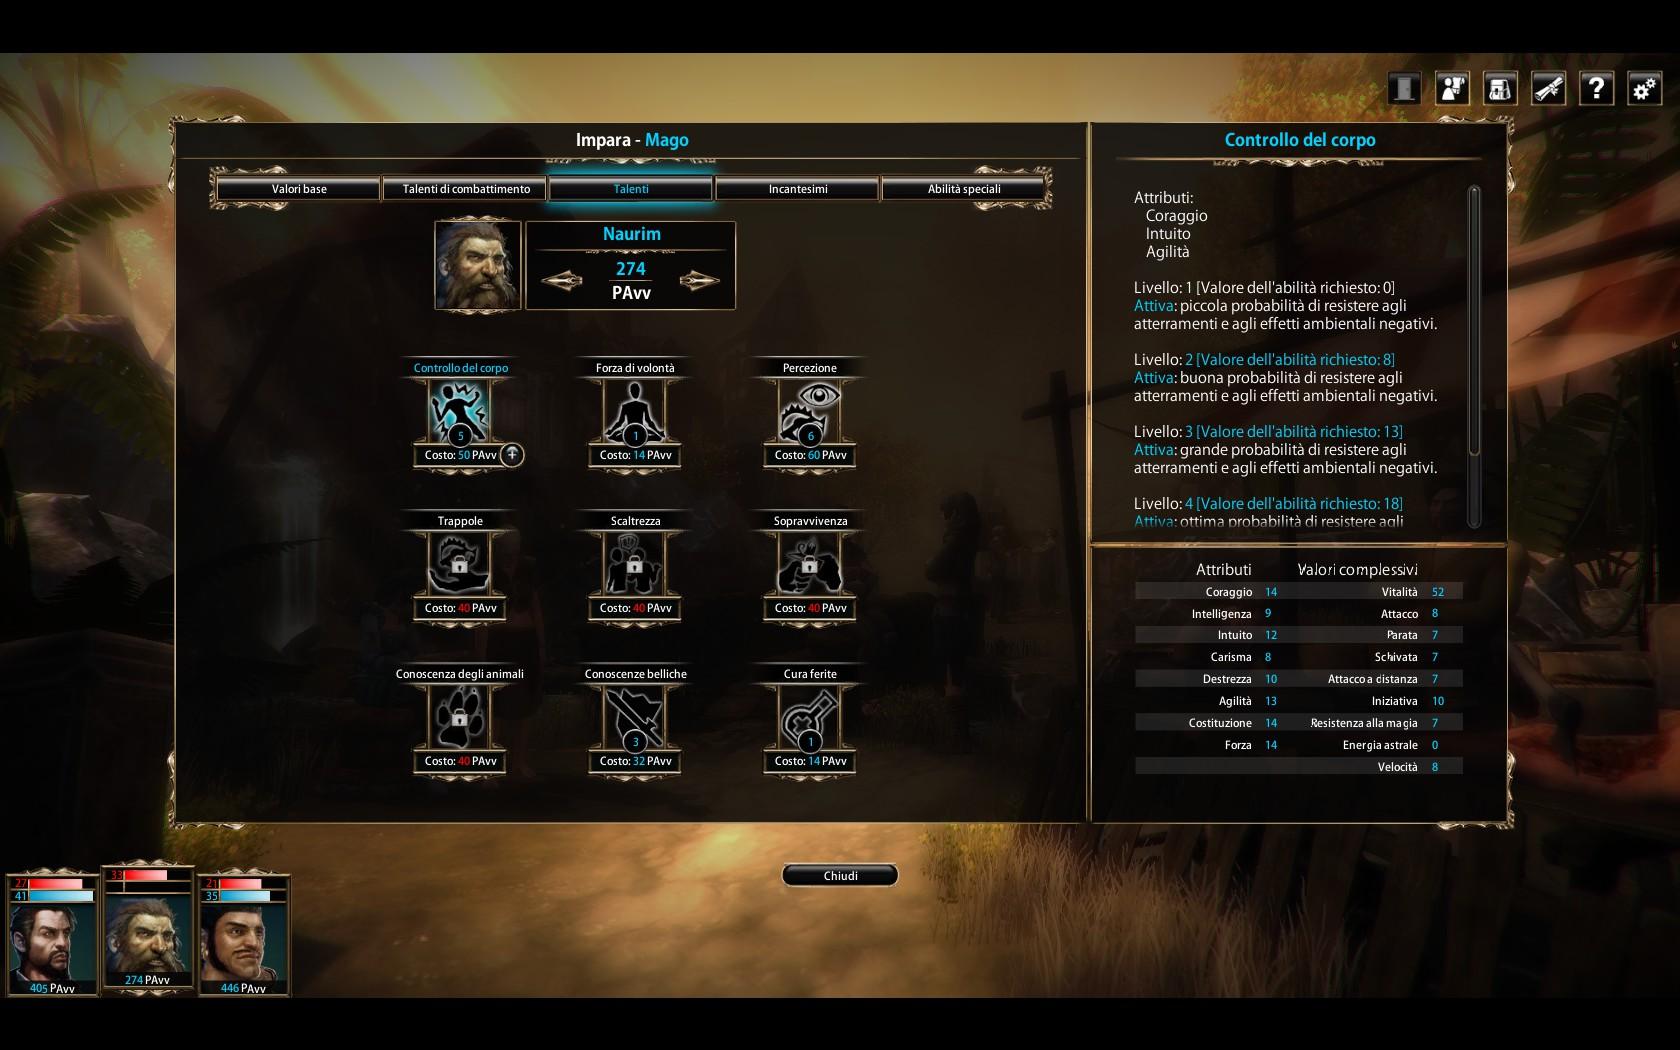 Blackguards stats